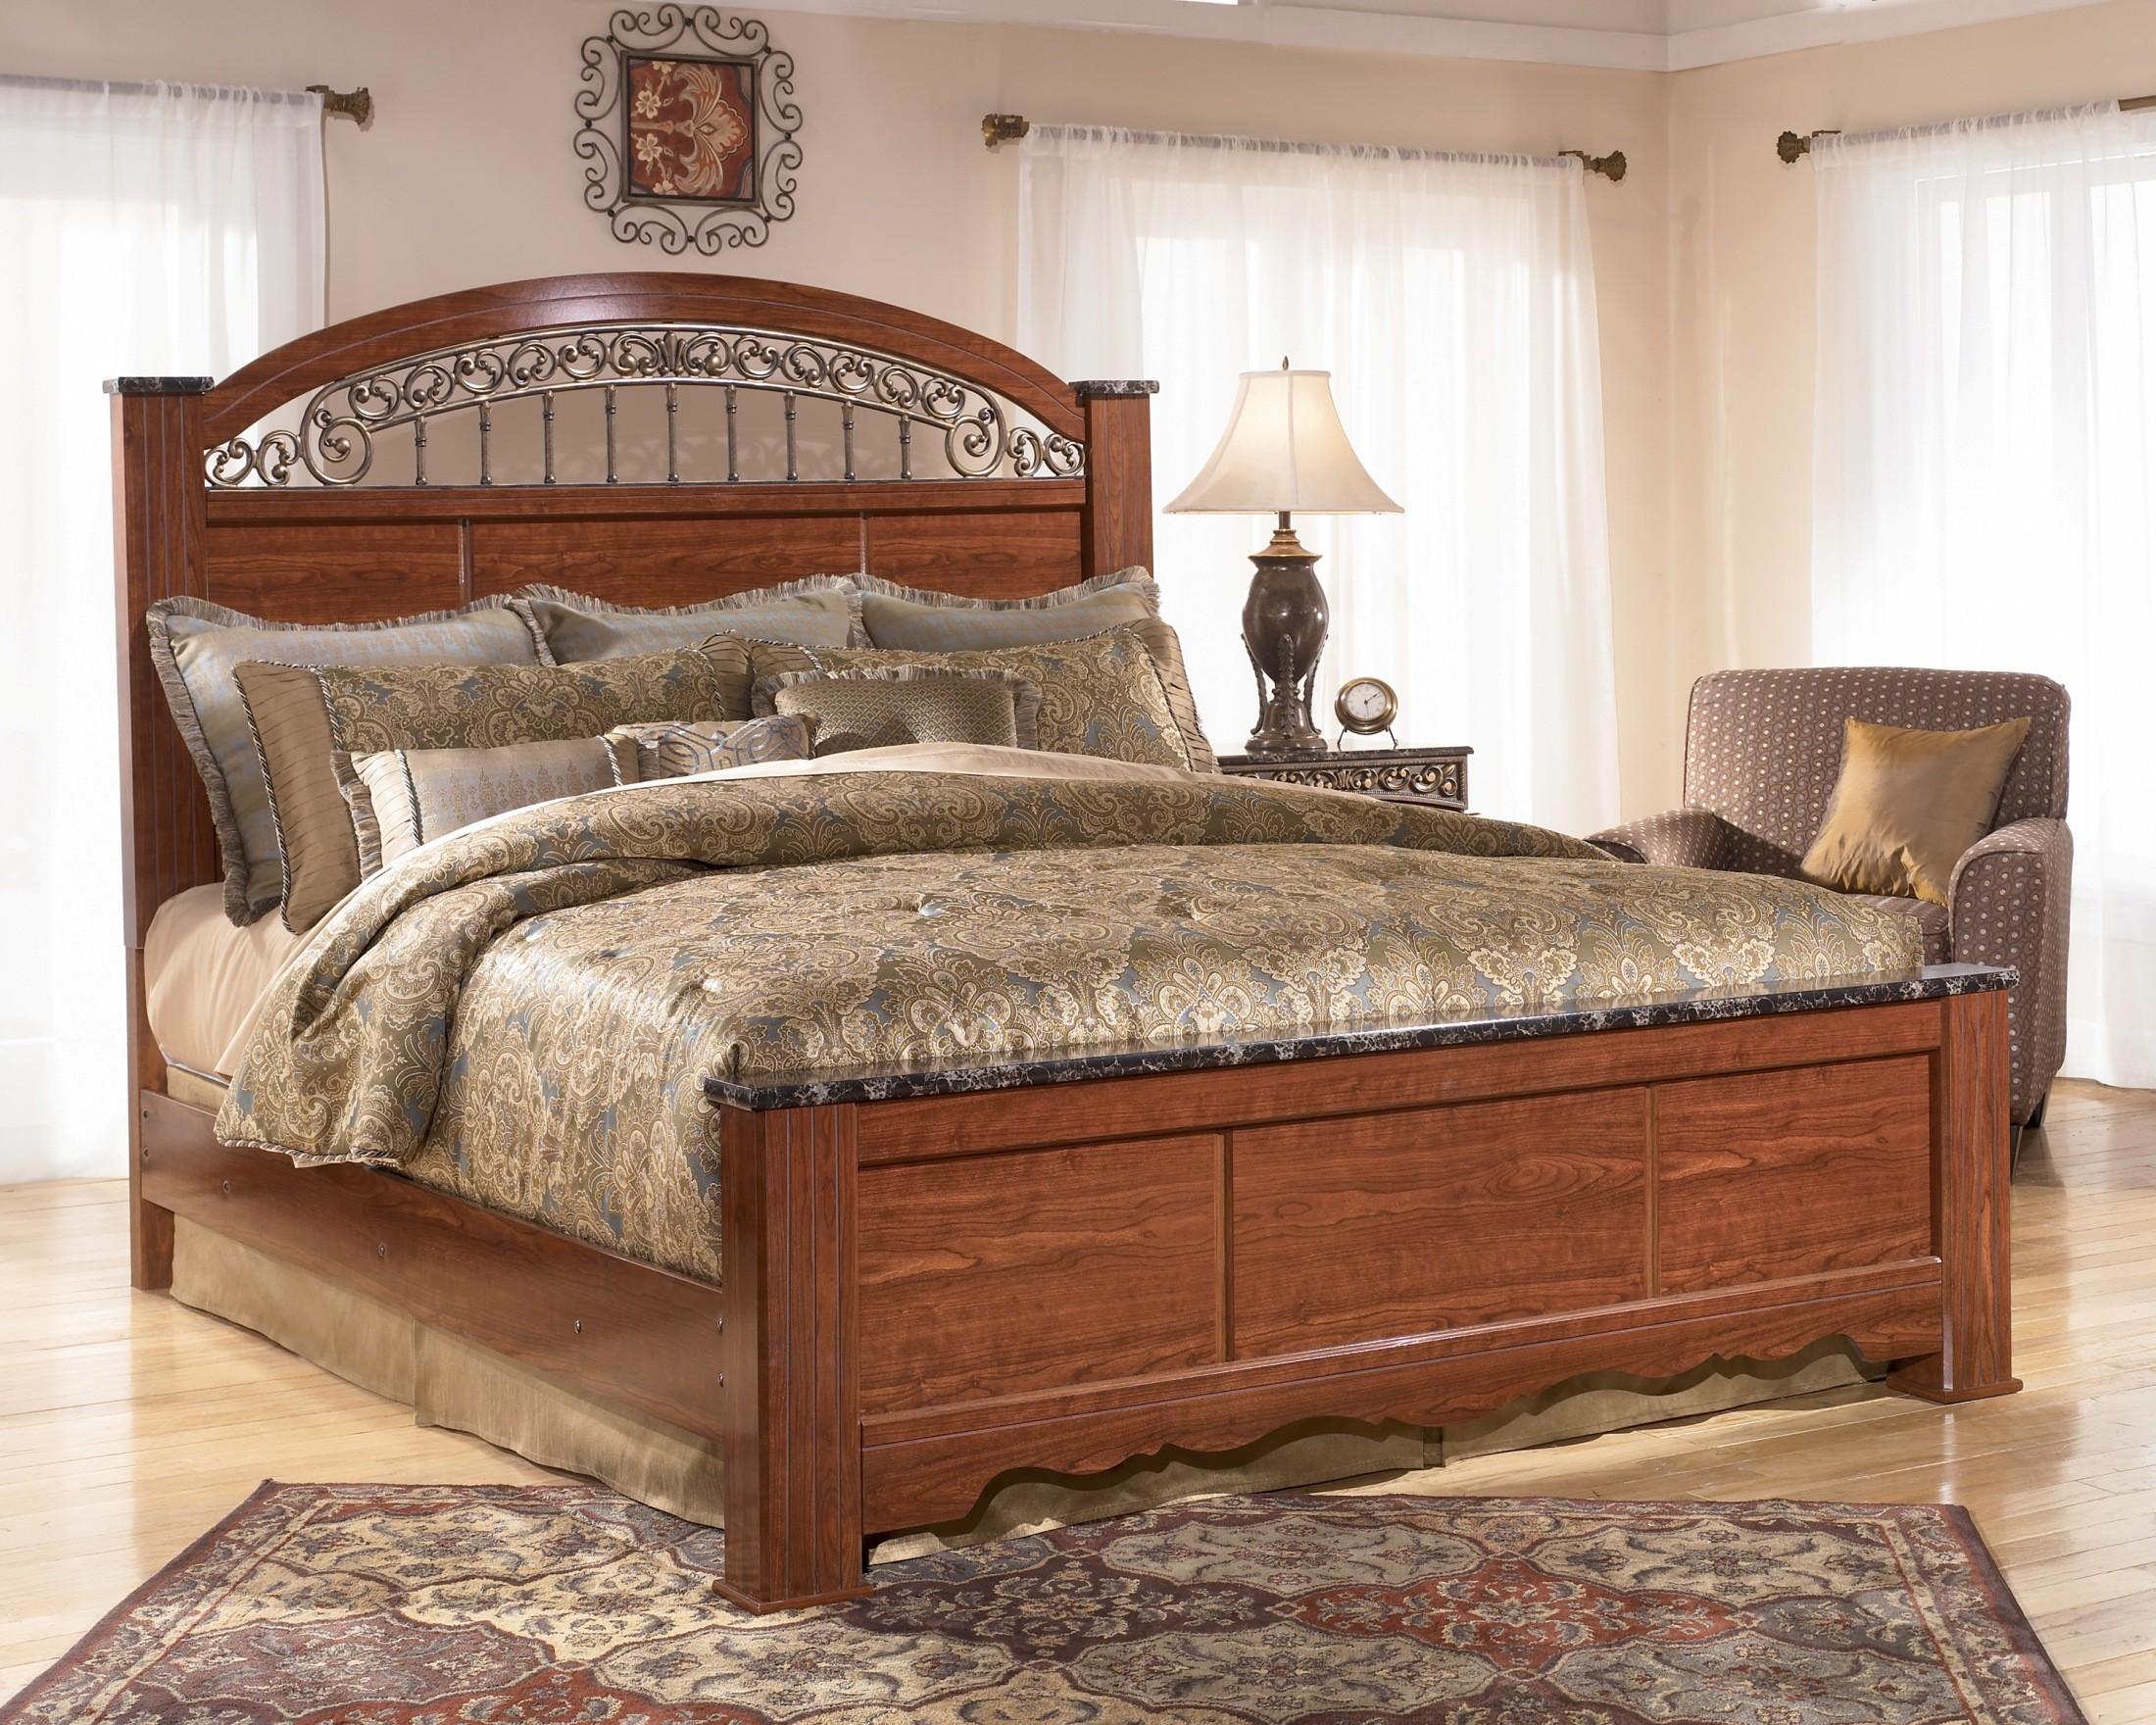 Fairbrooks Estate Queen Poster Bed